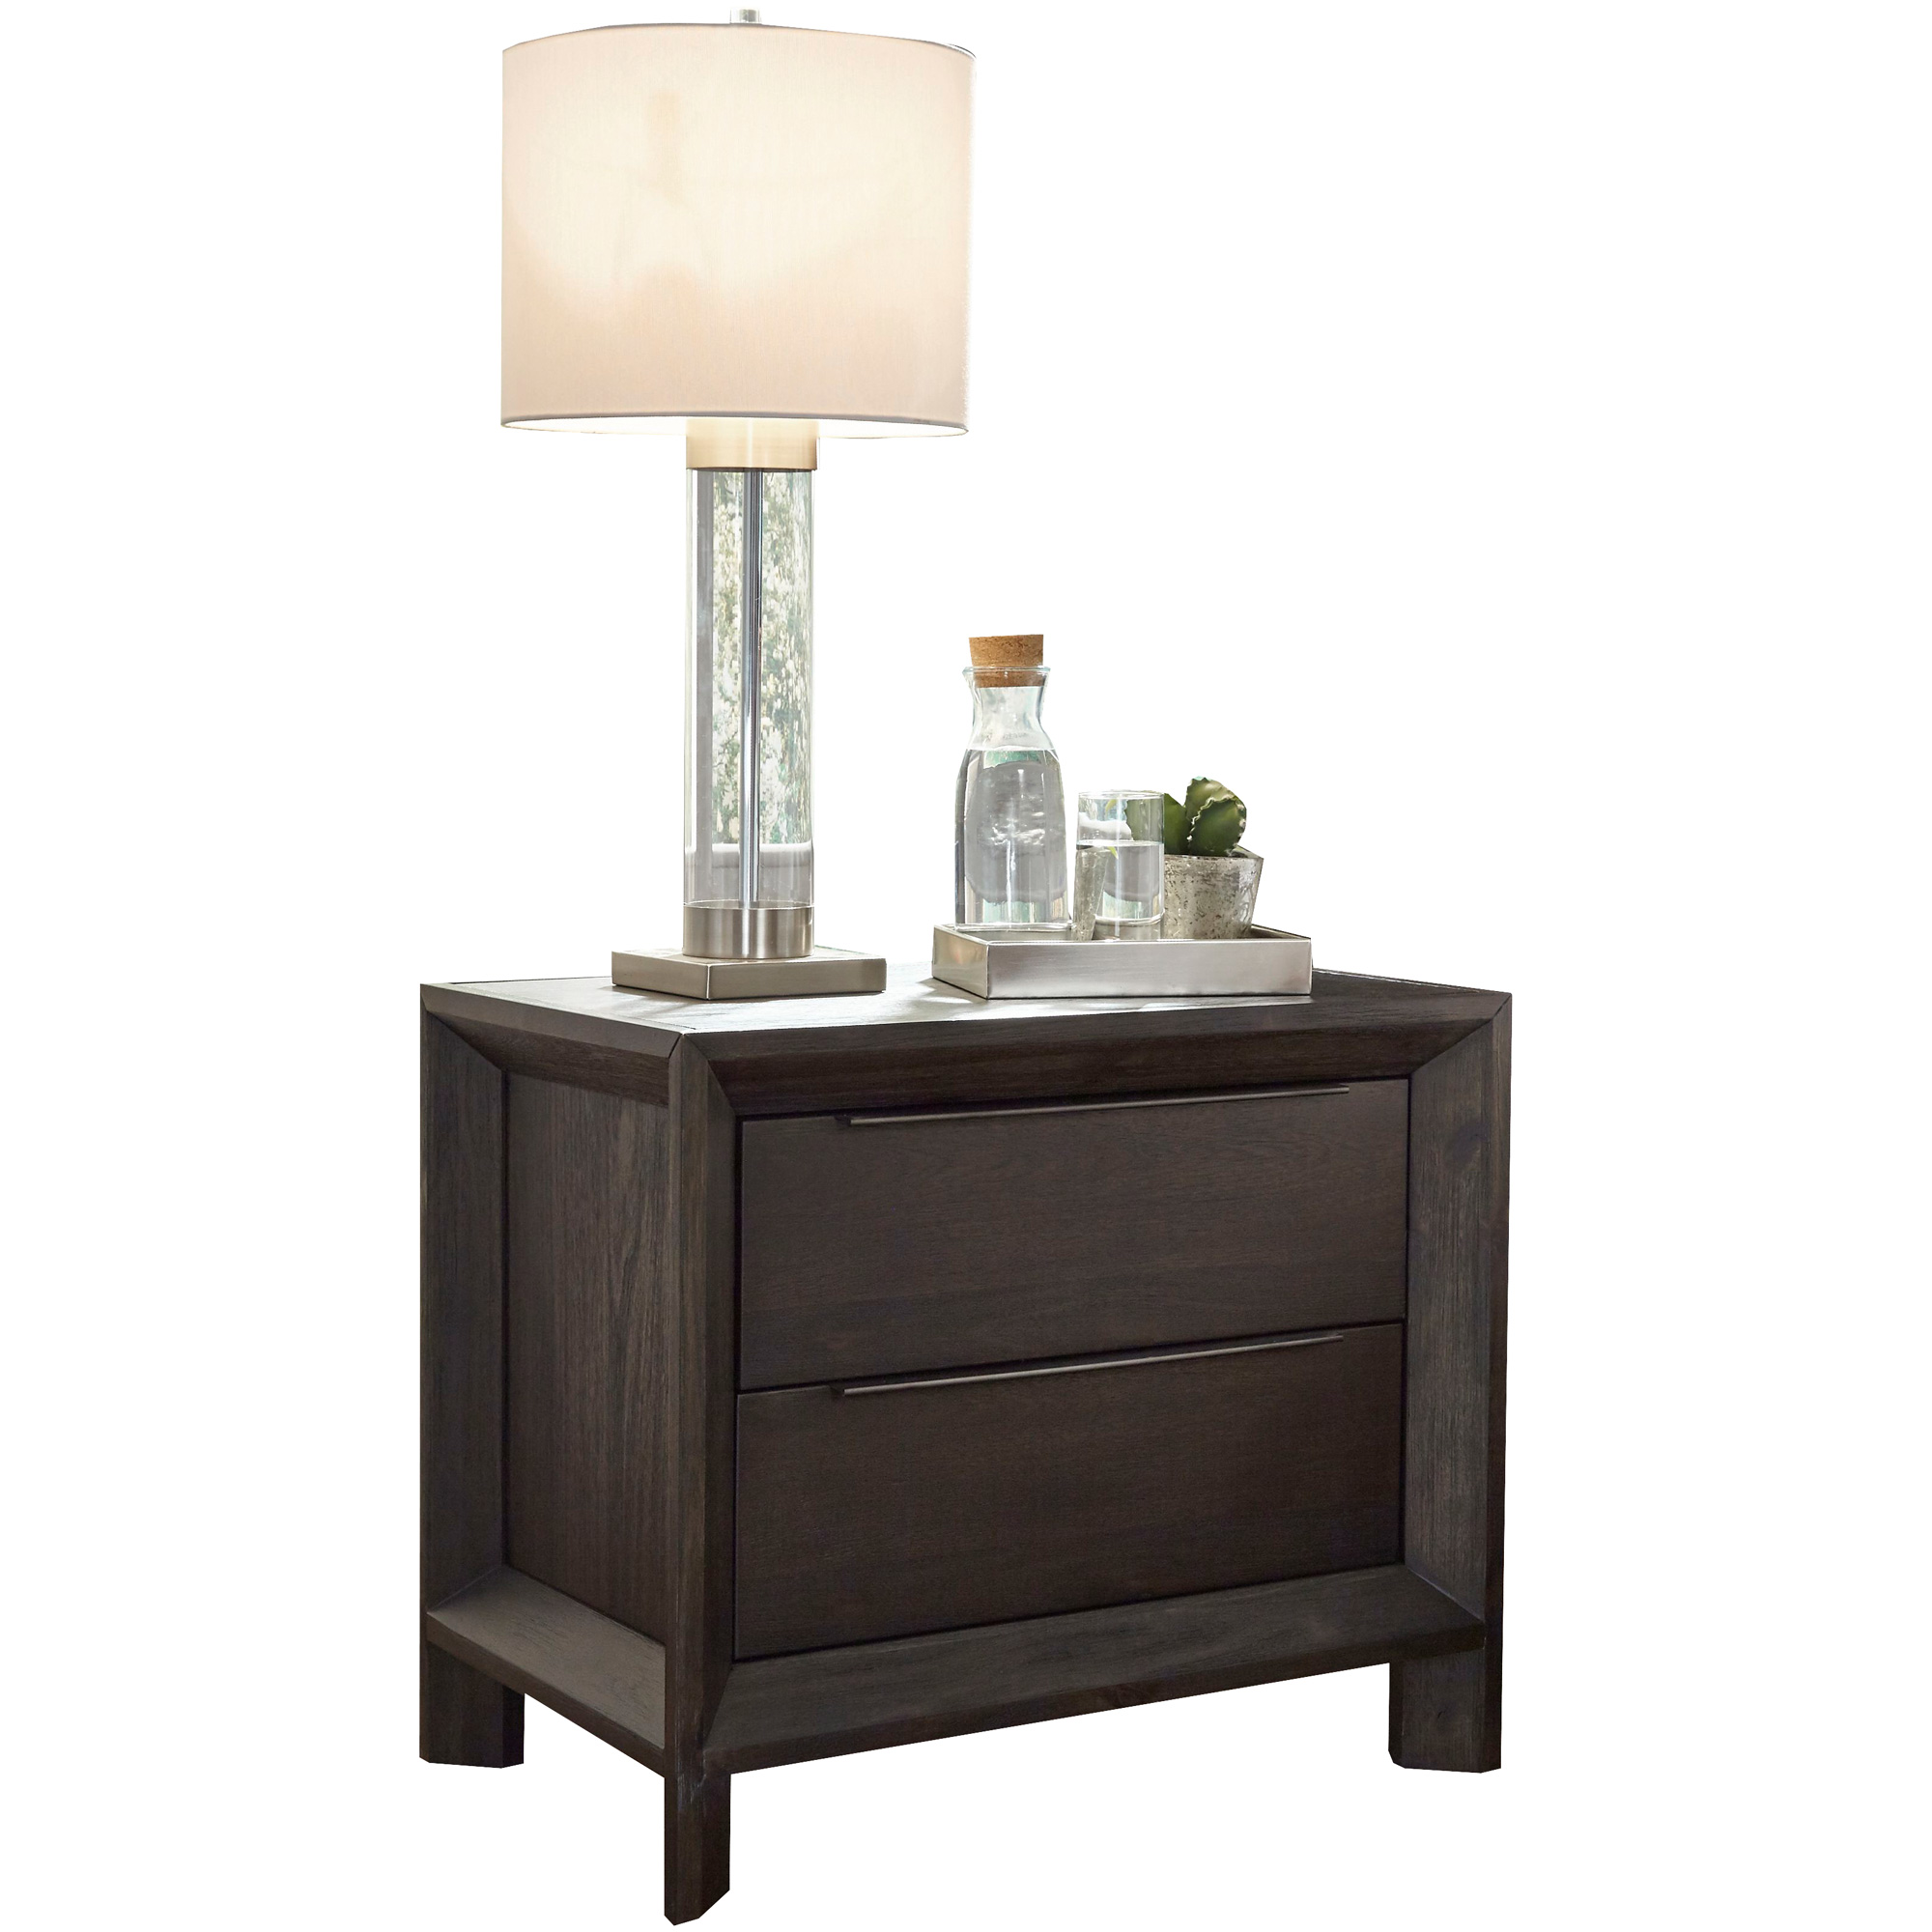 Modus Furniture International | Chloe Basalt Gray Nightstand